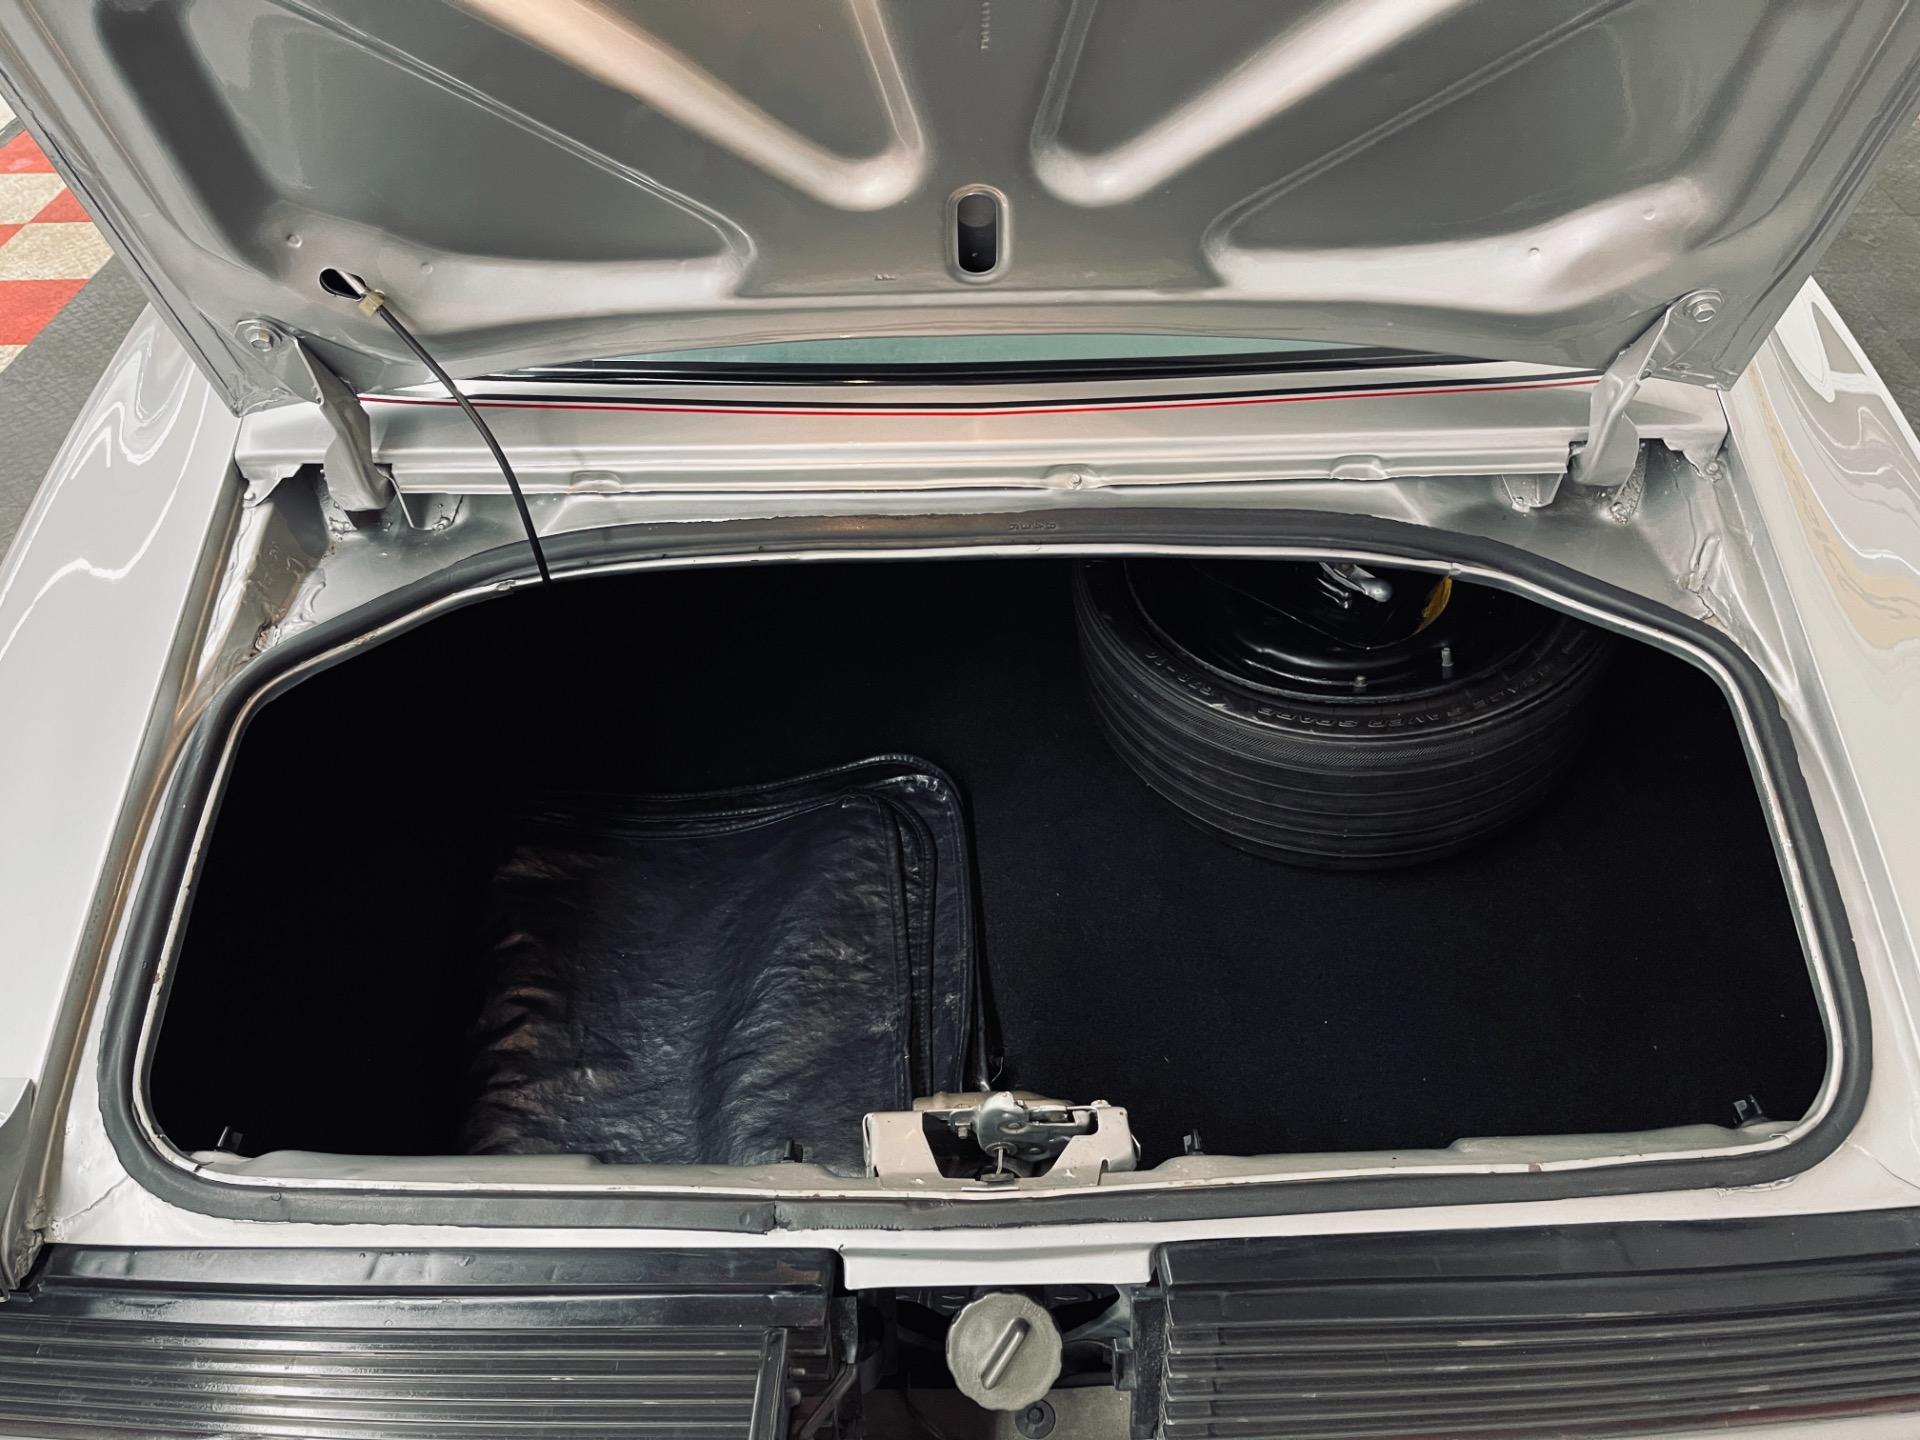 Used 1979 Pontiac Firebird - SILVER 10TH ANNIVERSARY TRANS AM - 4 SPEED MANUAL - SEE VIDEO - | Mundelein, IL